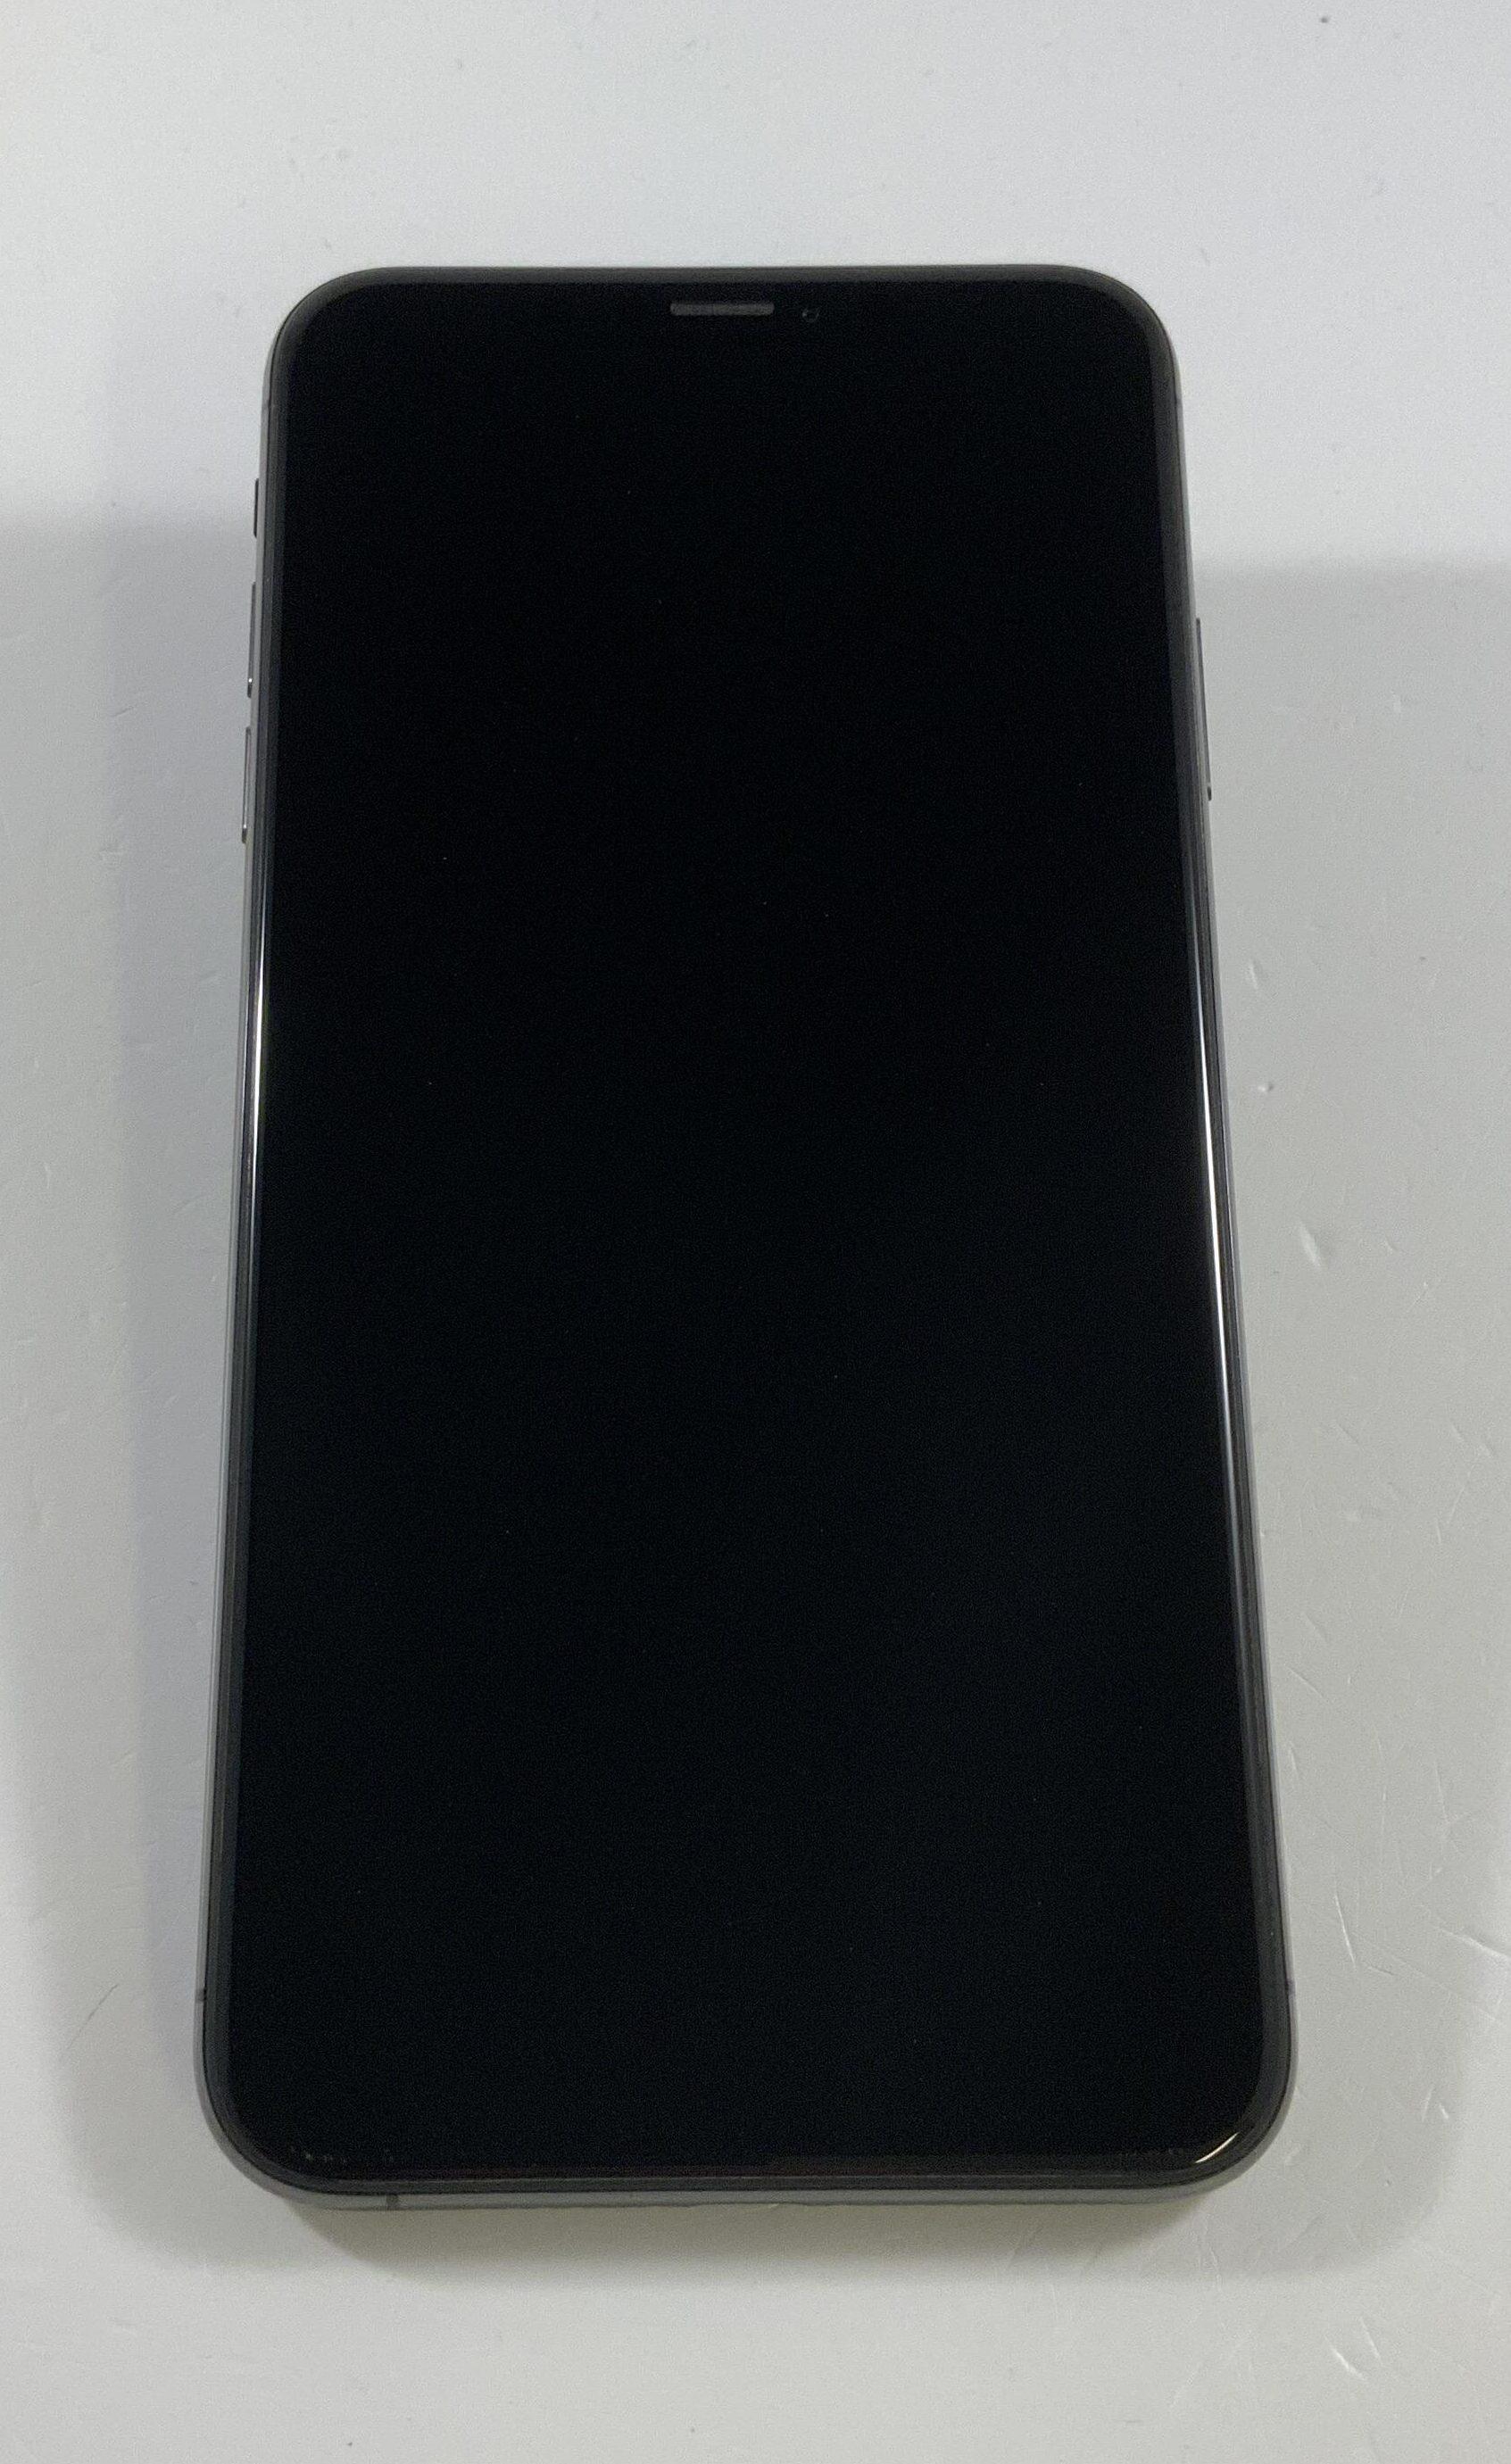 iPhone XS Max 256GB, 256GB, Space Gray, image 1